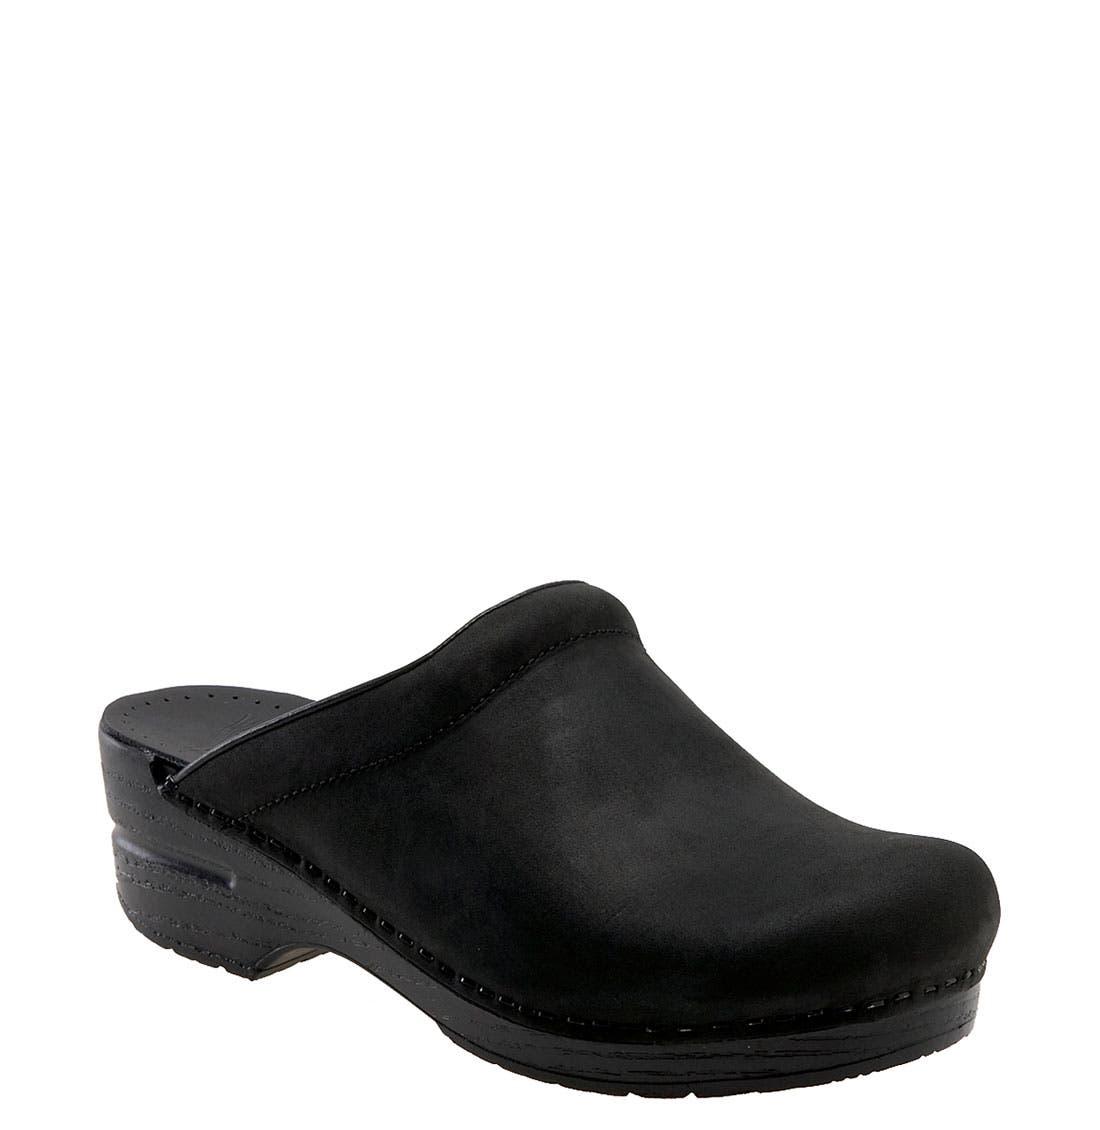 'Sonja' Oiled Leather Clog,                             Main thumbnail 1, color,                             Black Oiled